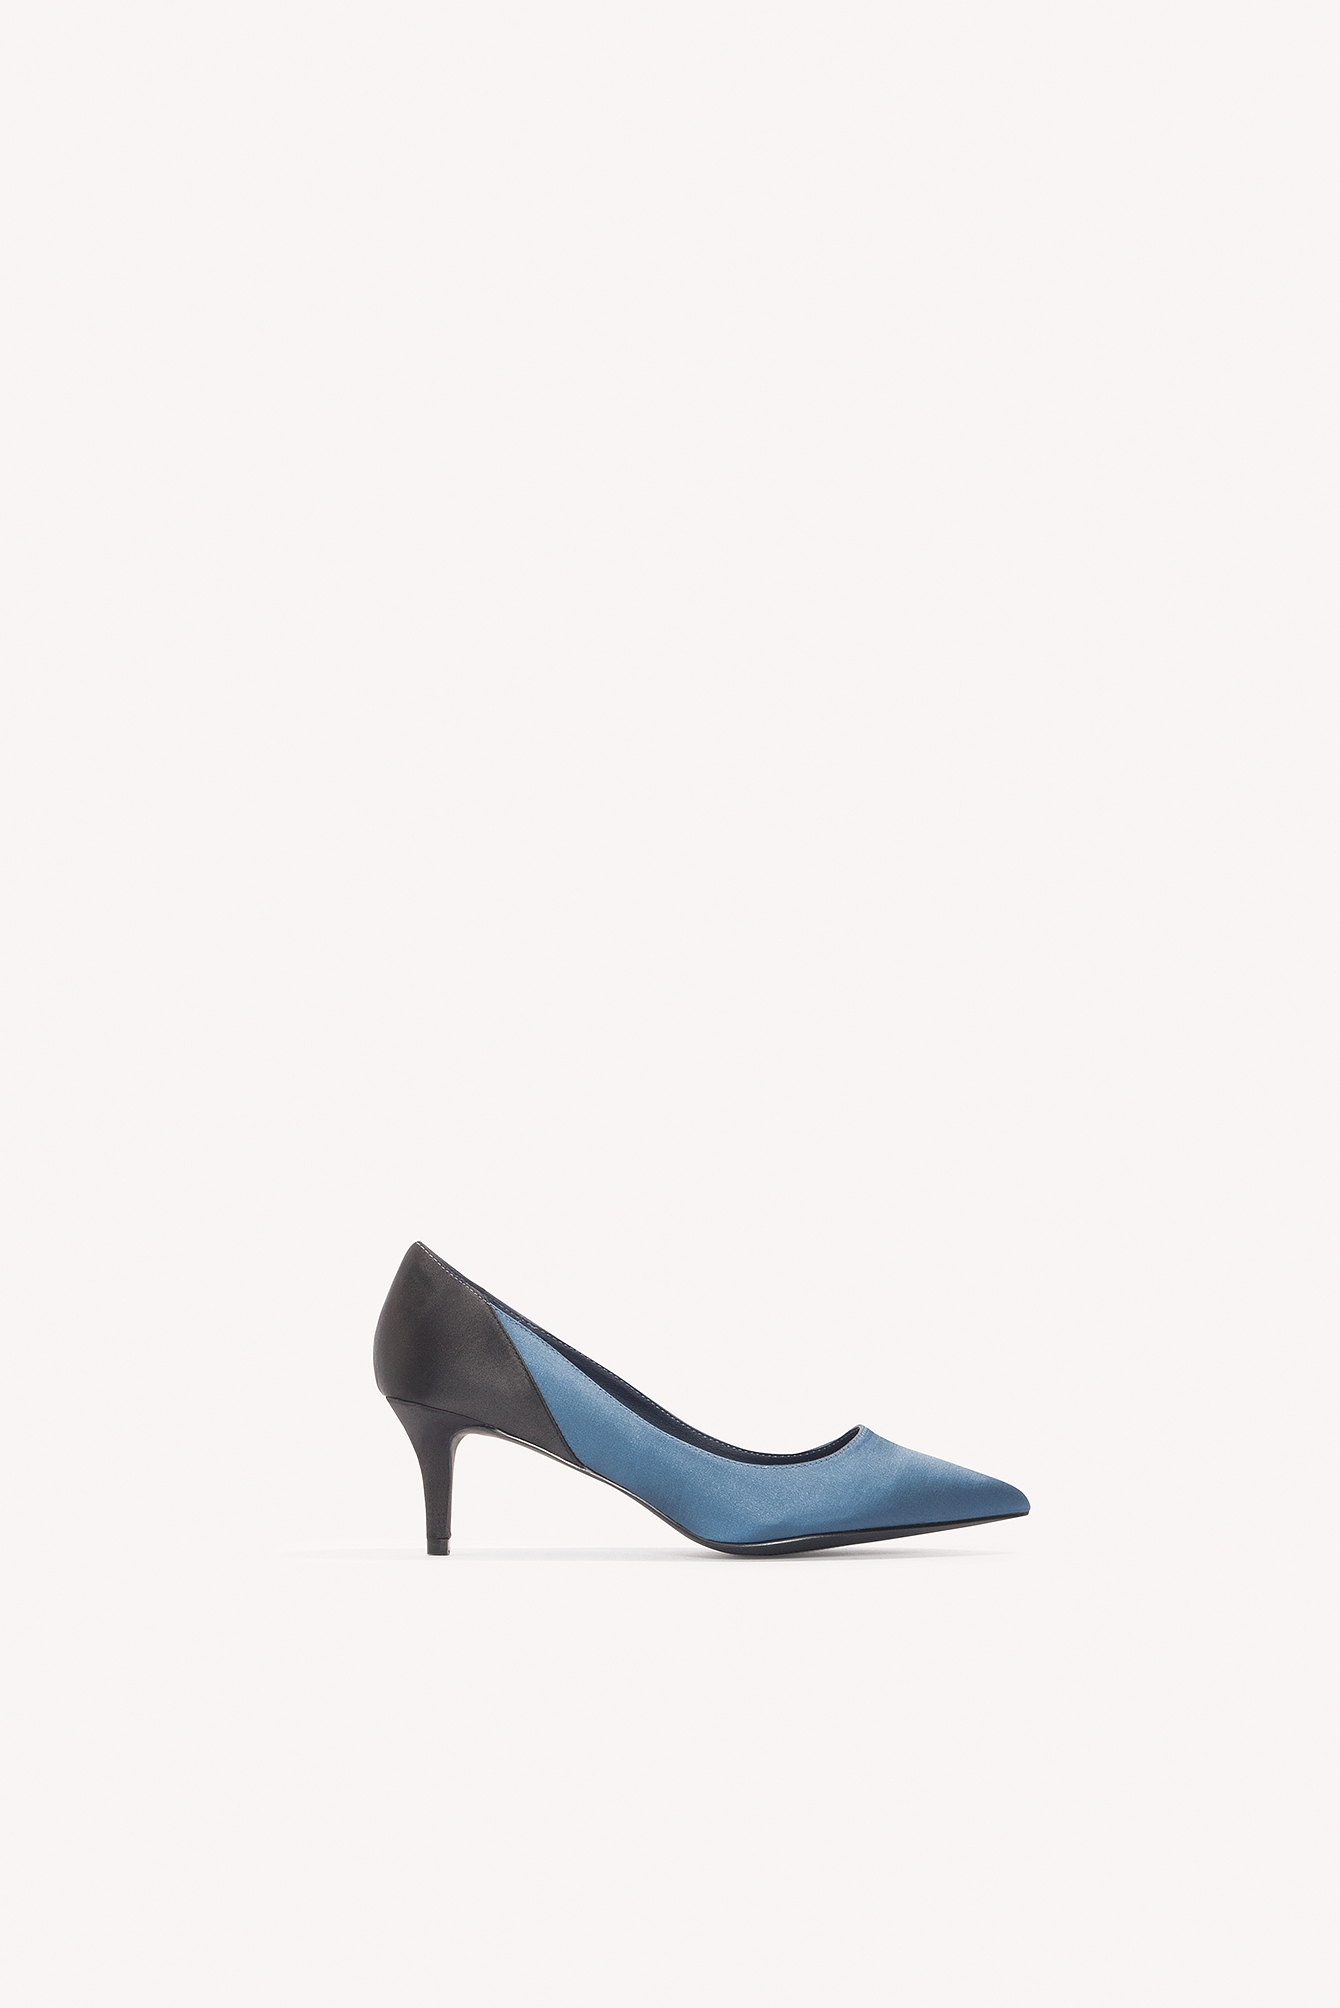 NA-KD Shoes Block Mid Heel Satin Pumps Blue